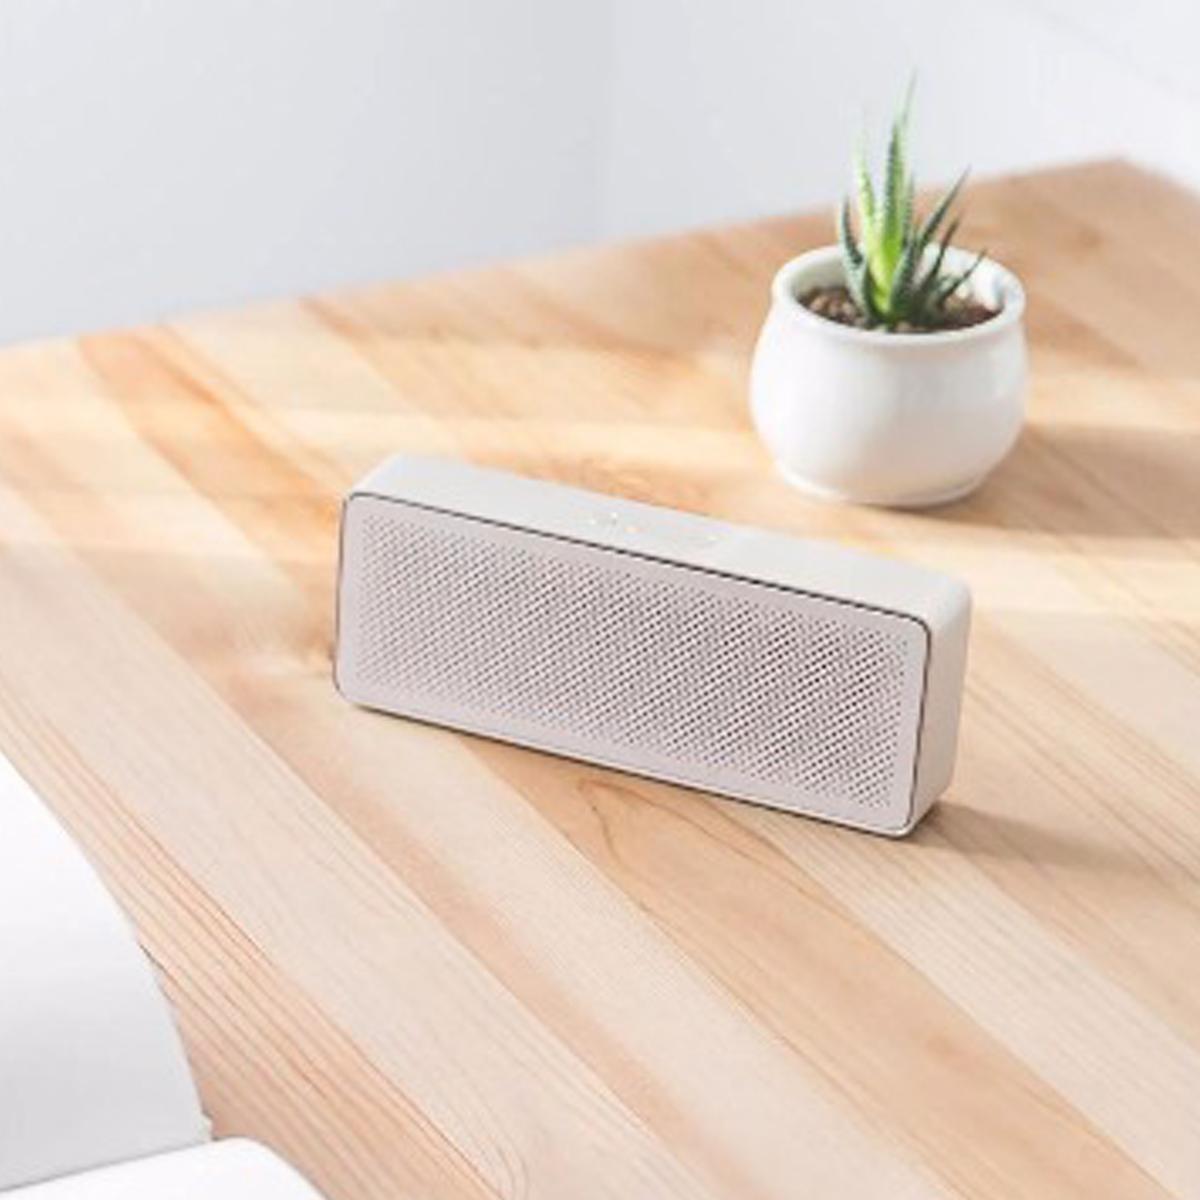 XIAOMI Wireless Bluetooth Speaker 2 Square Box Design with Mic Bluetooth Stereo